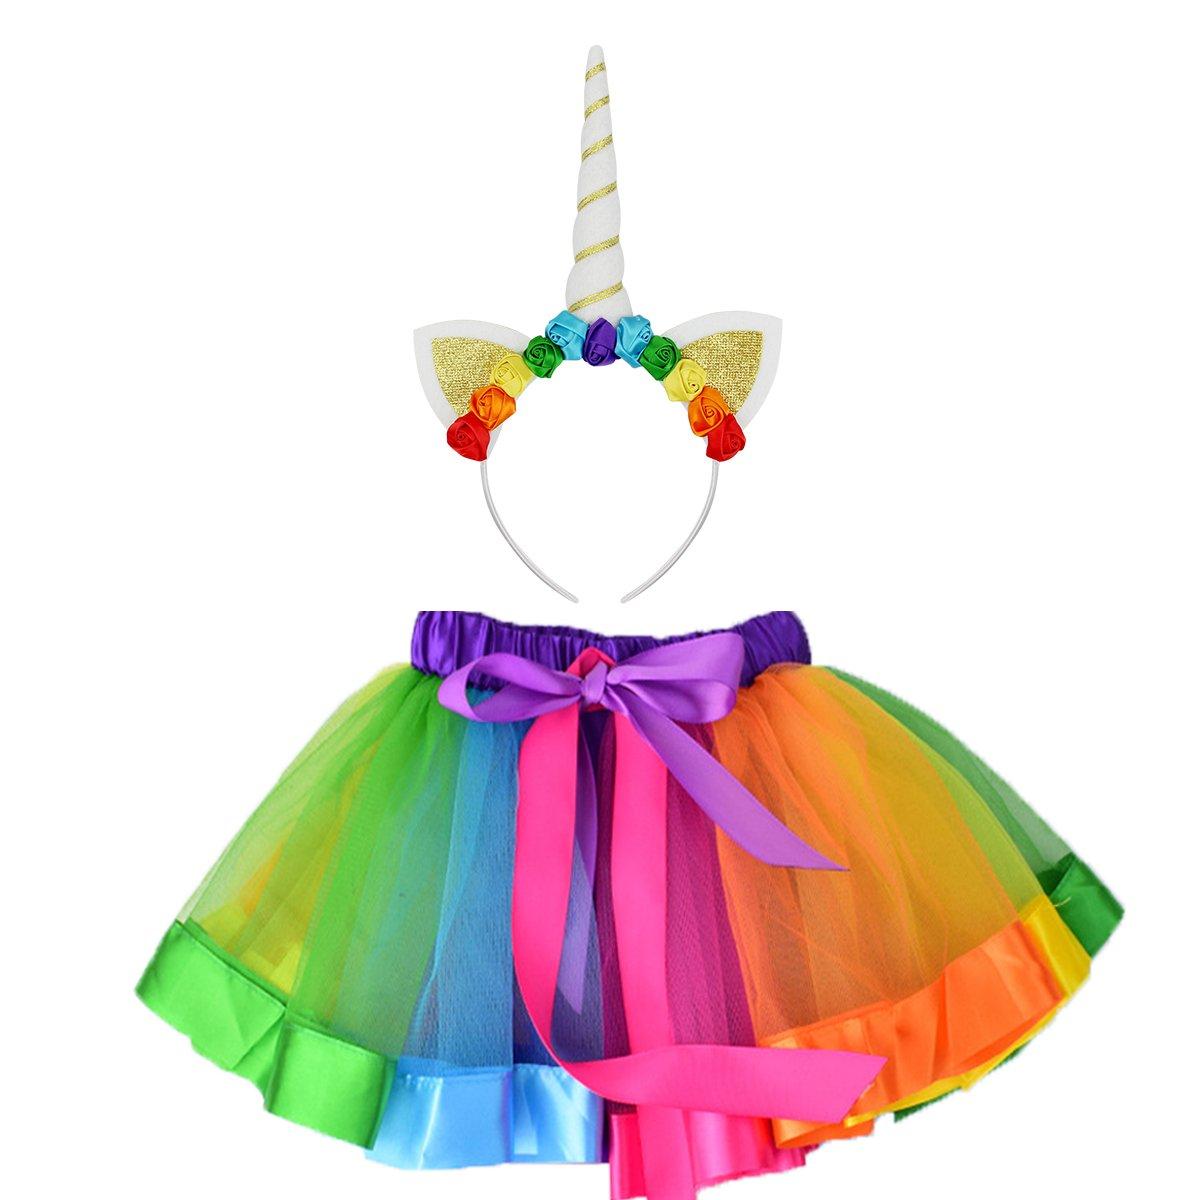 Sparkling Unicorn Tutu Skirt and Headband for Girls Birthday Party Costume Set Light In Dark